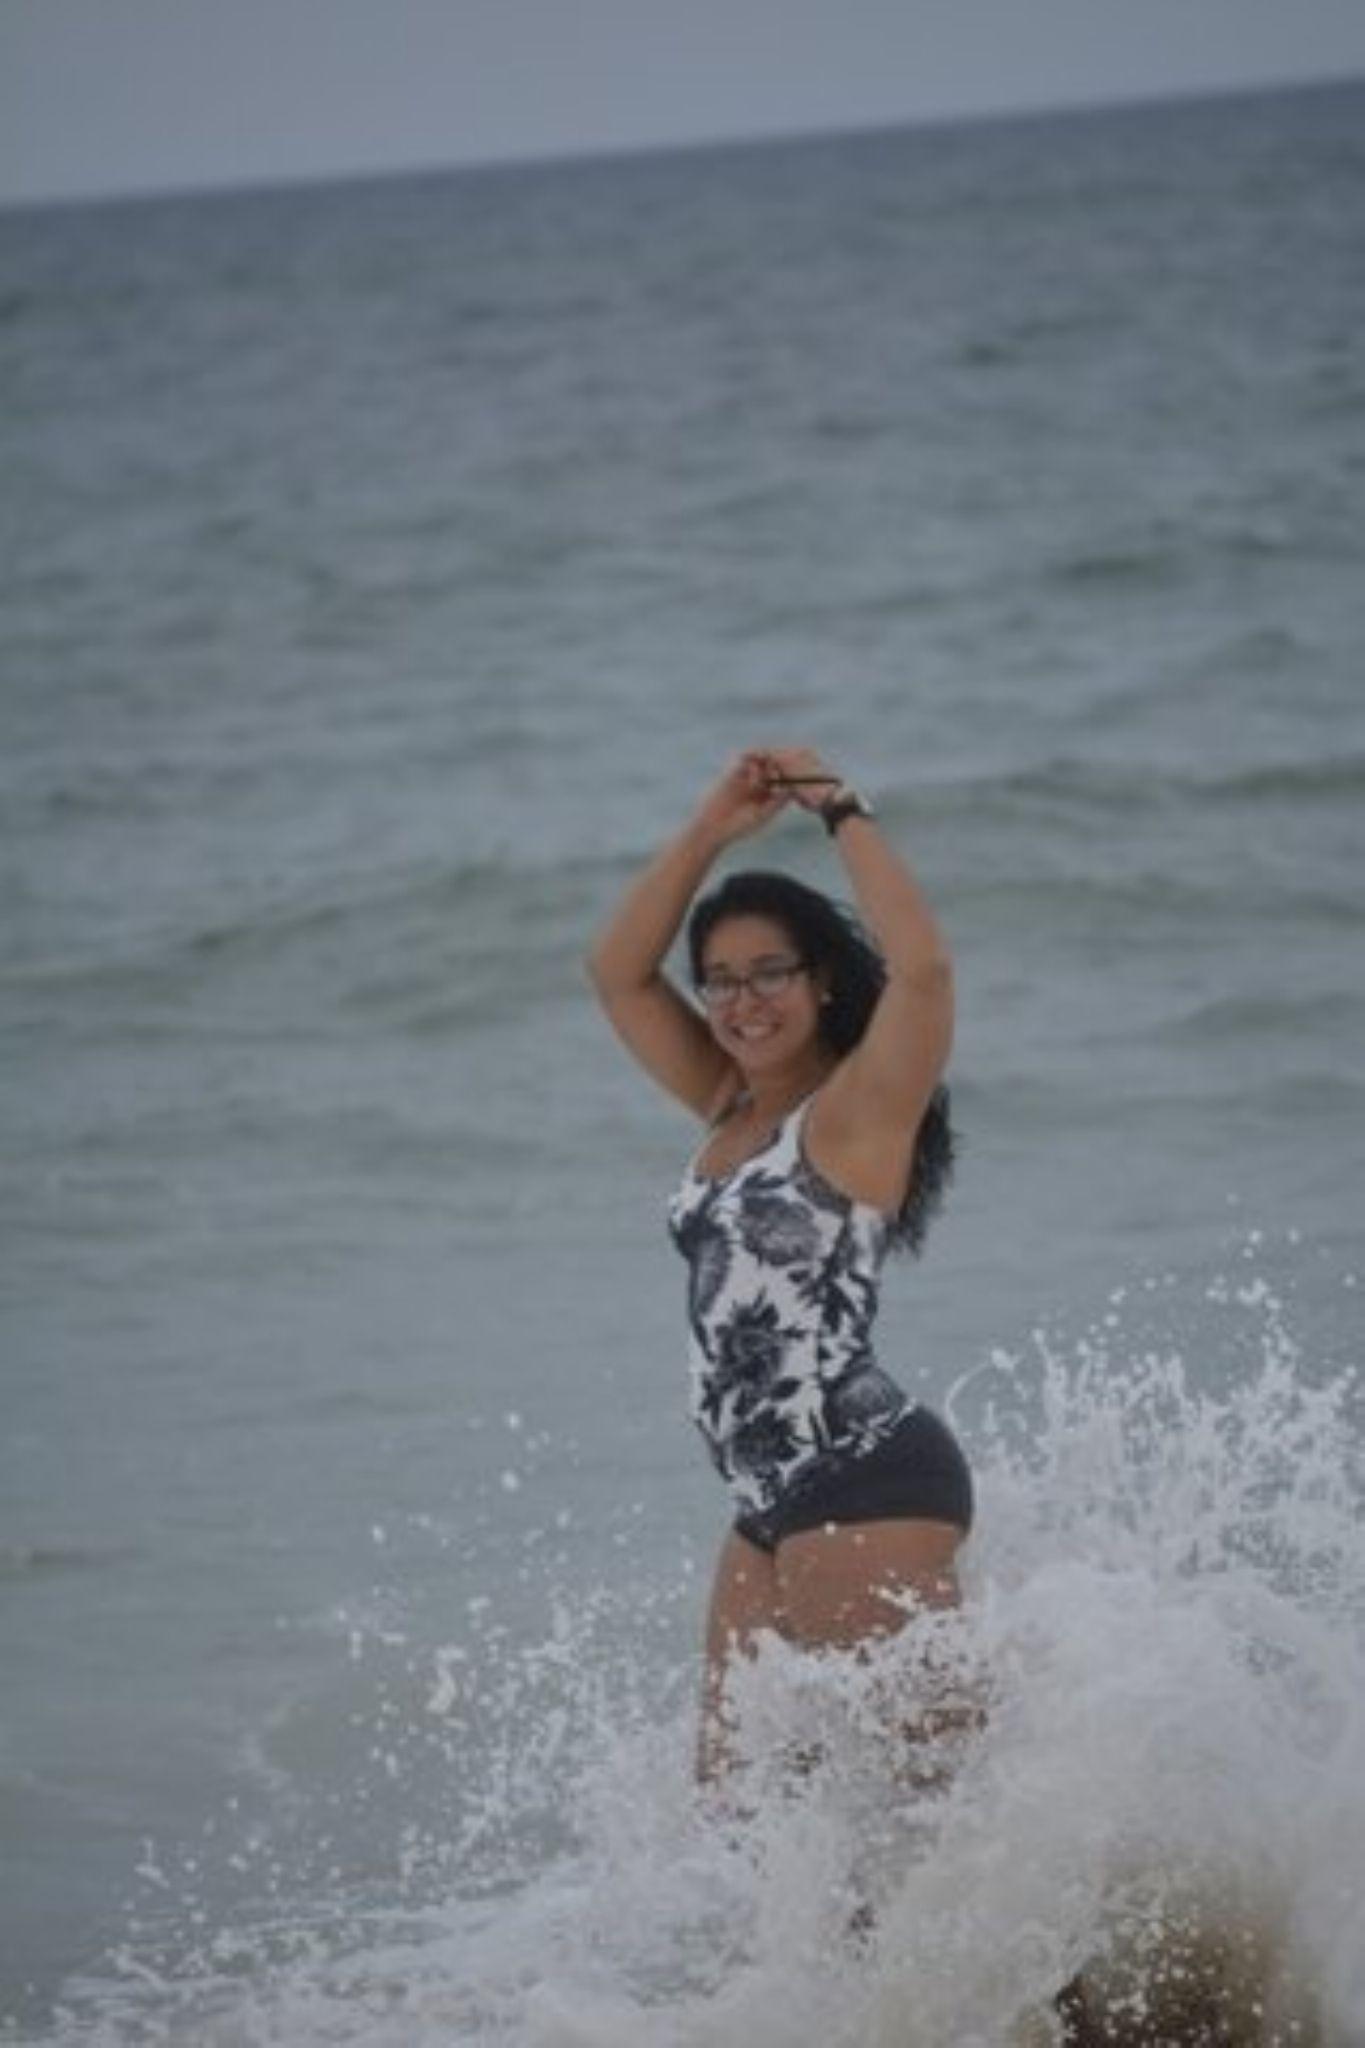 Dancing in water by juanjose.hernandez.9210